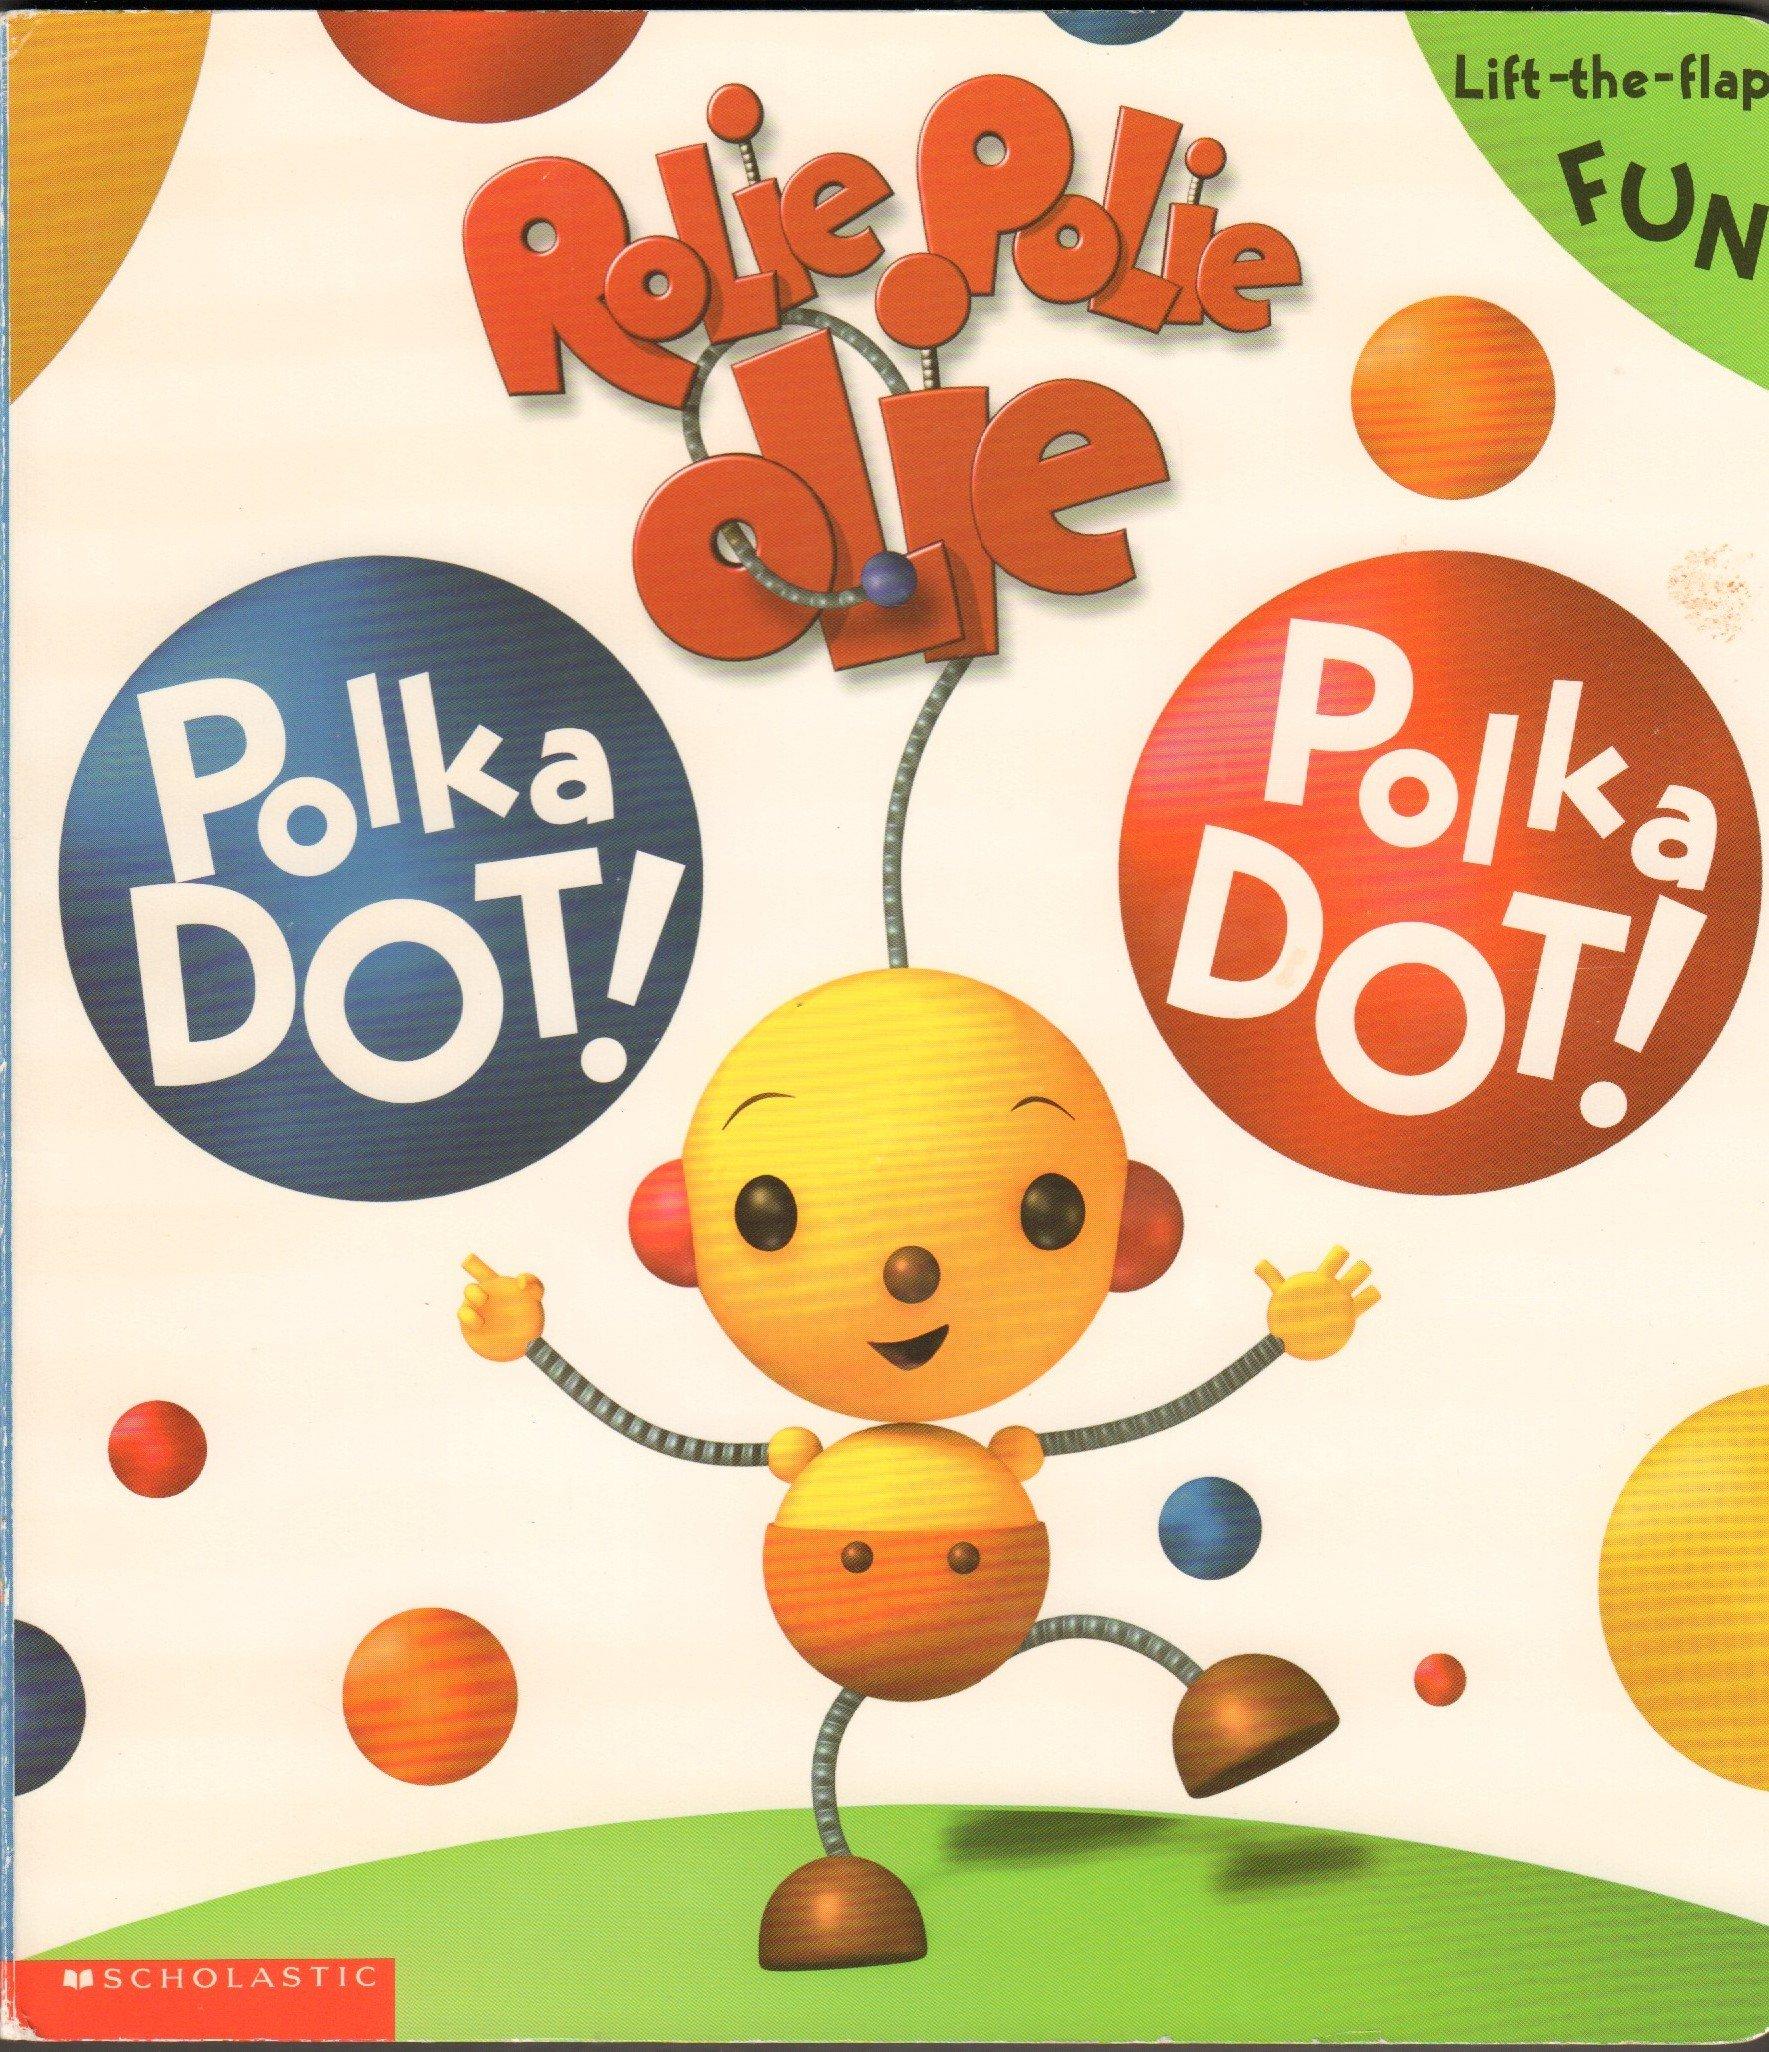 amazon com rolie polie olie polka dot polka dot a giant lift